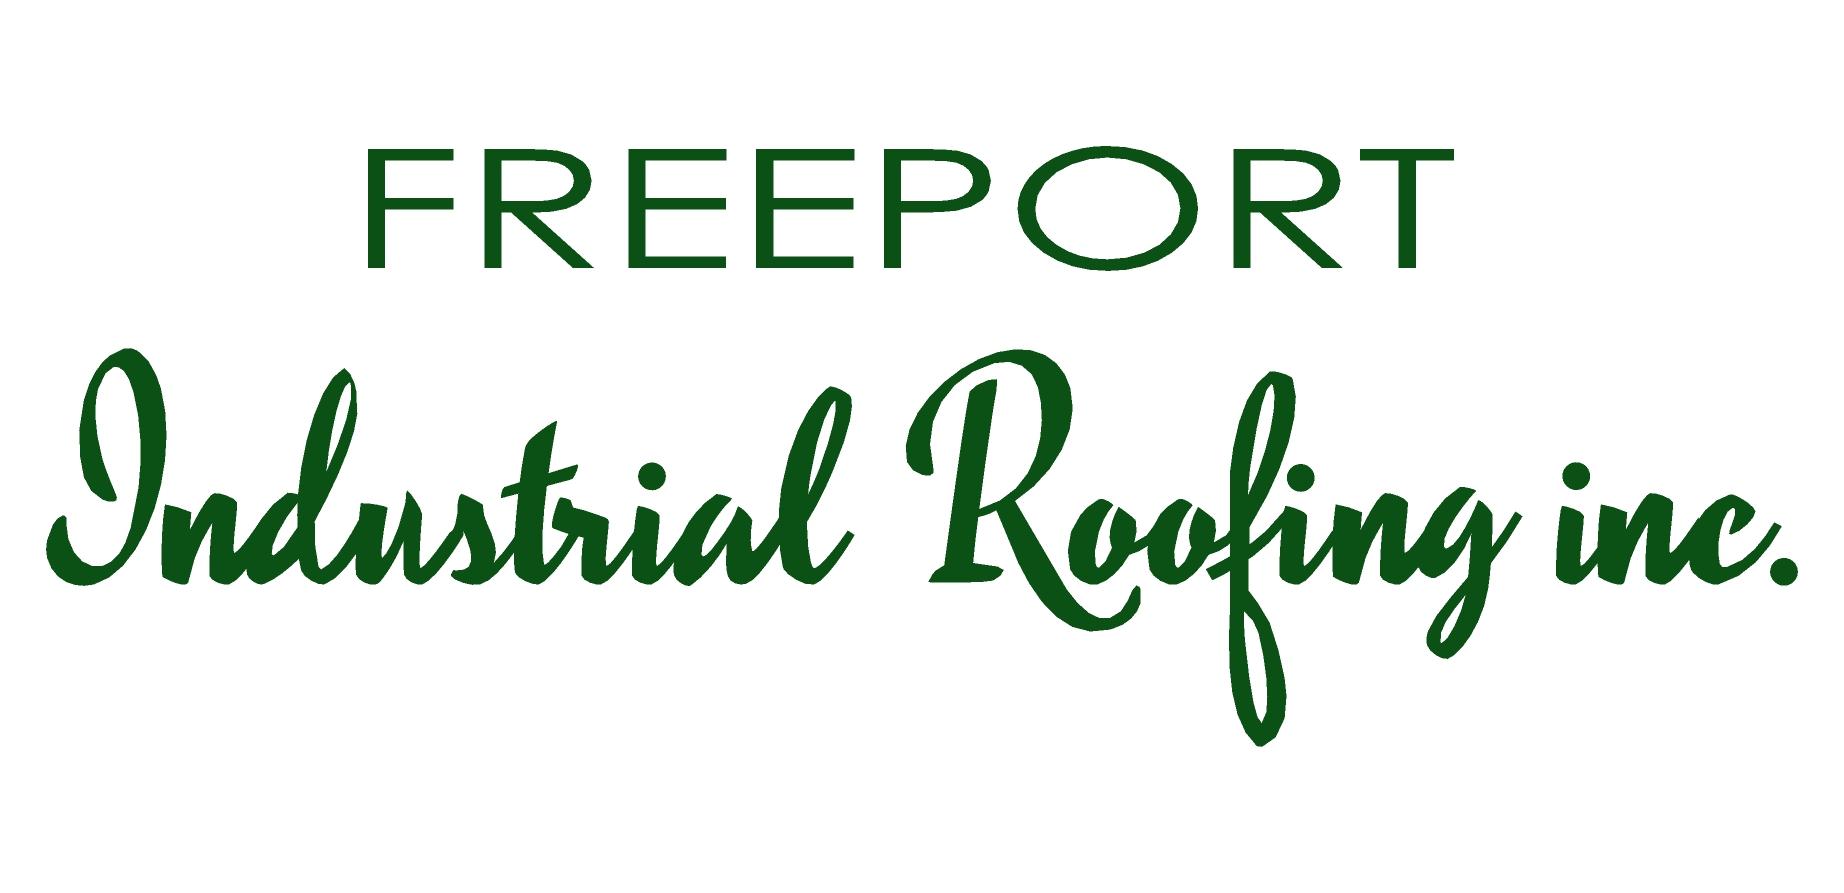 Freeport Industrial Roofing logo